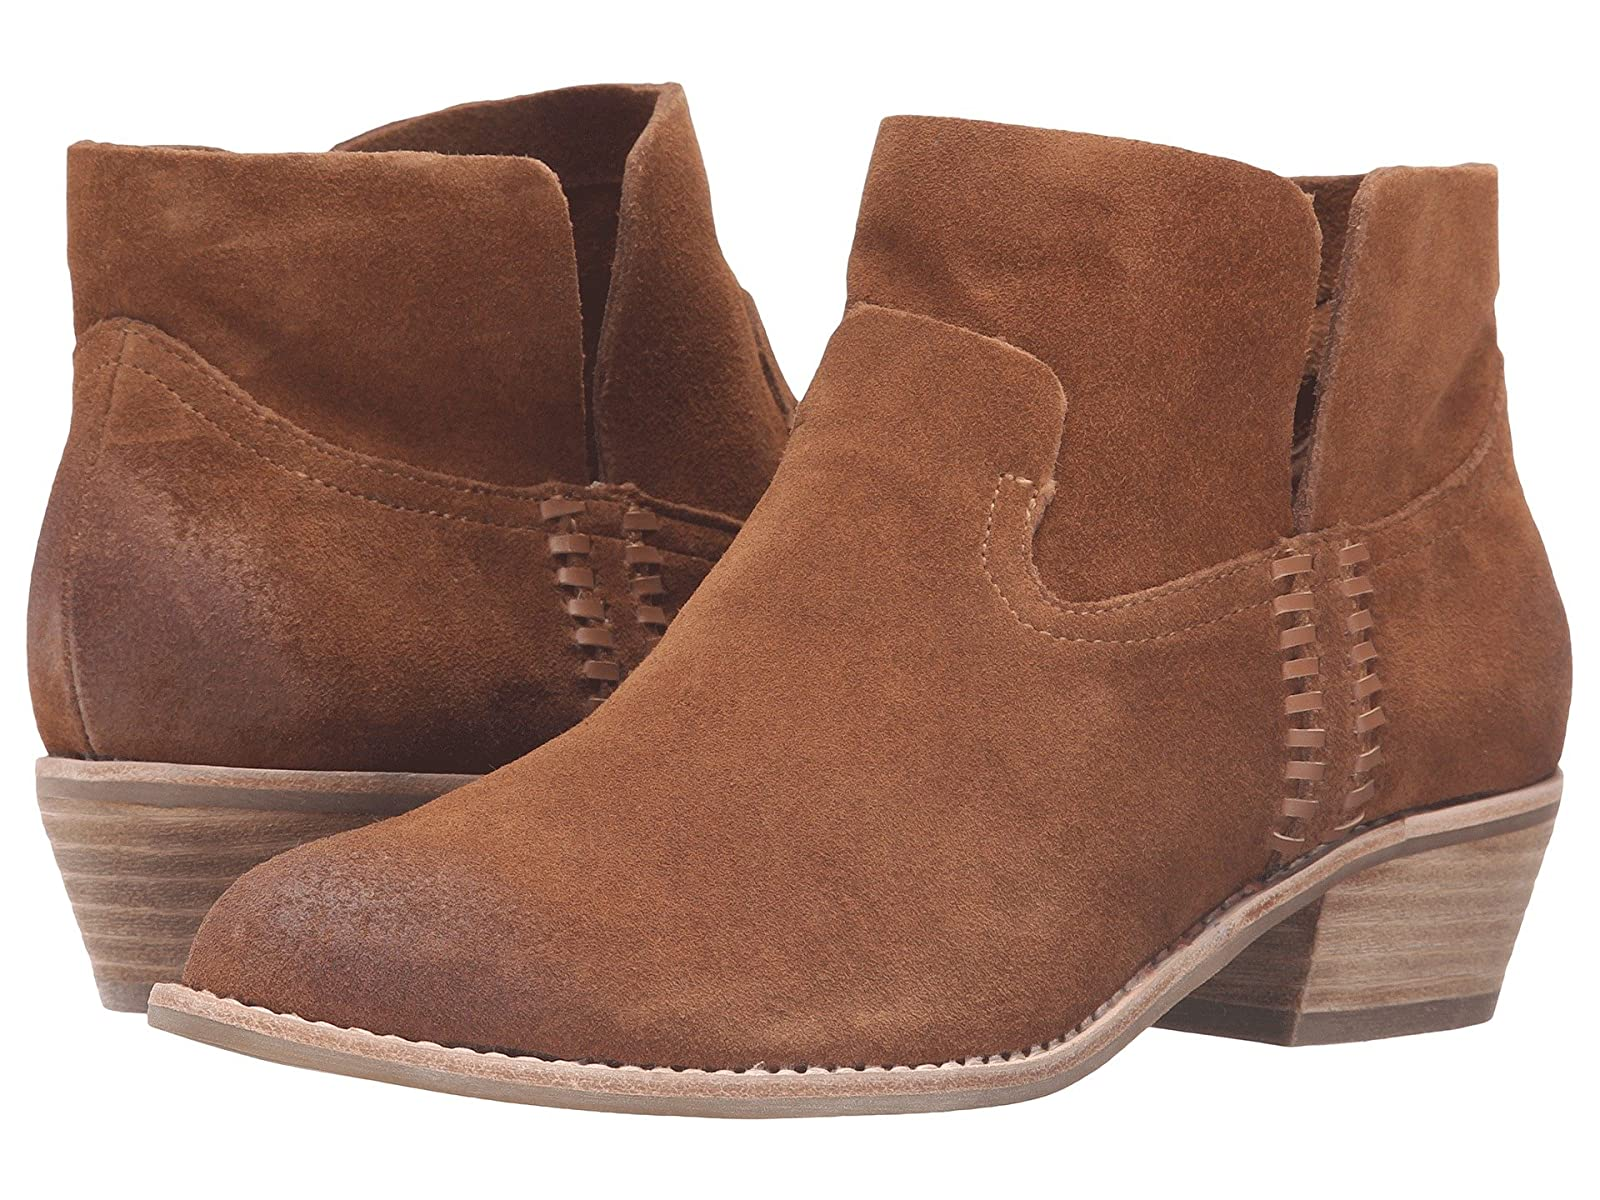 Dolce Vita ChareeCheap and distinctive eye-catching shoes